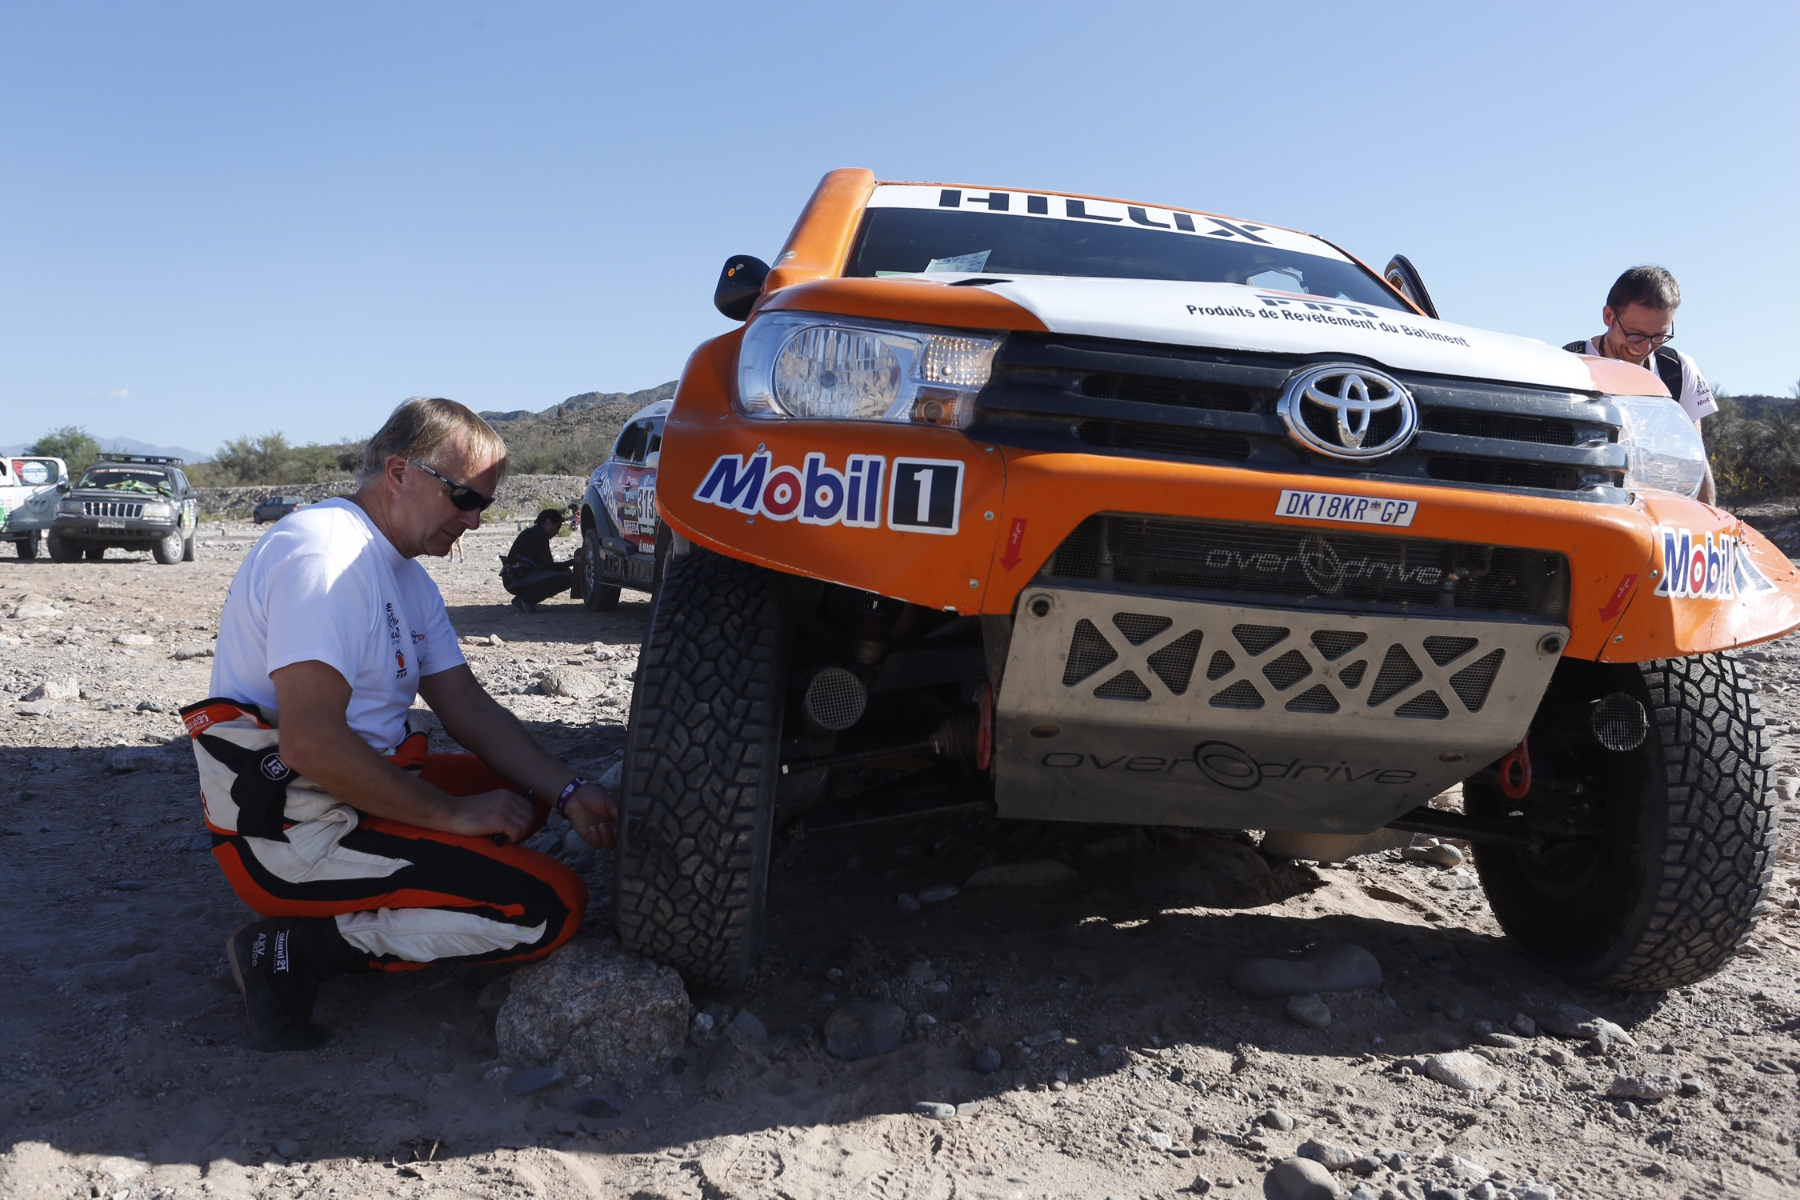 316 CHABOT Ronan (fra) PILLOT Gilles (fra) TOYOTA ambiance during the Dakar 2016 Argentina,  Bolivia, Etape 9 / Stage 9, Belen - Belen,  from  January 12, 2016 - Photo Florent Gooden / DPPI